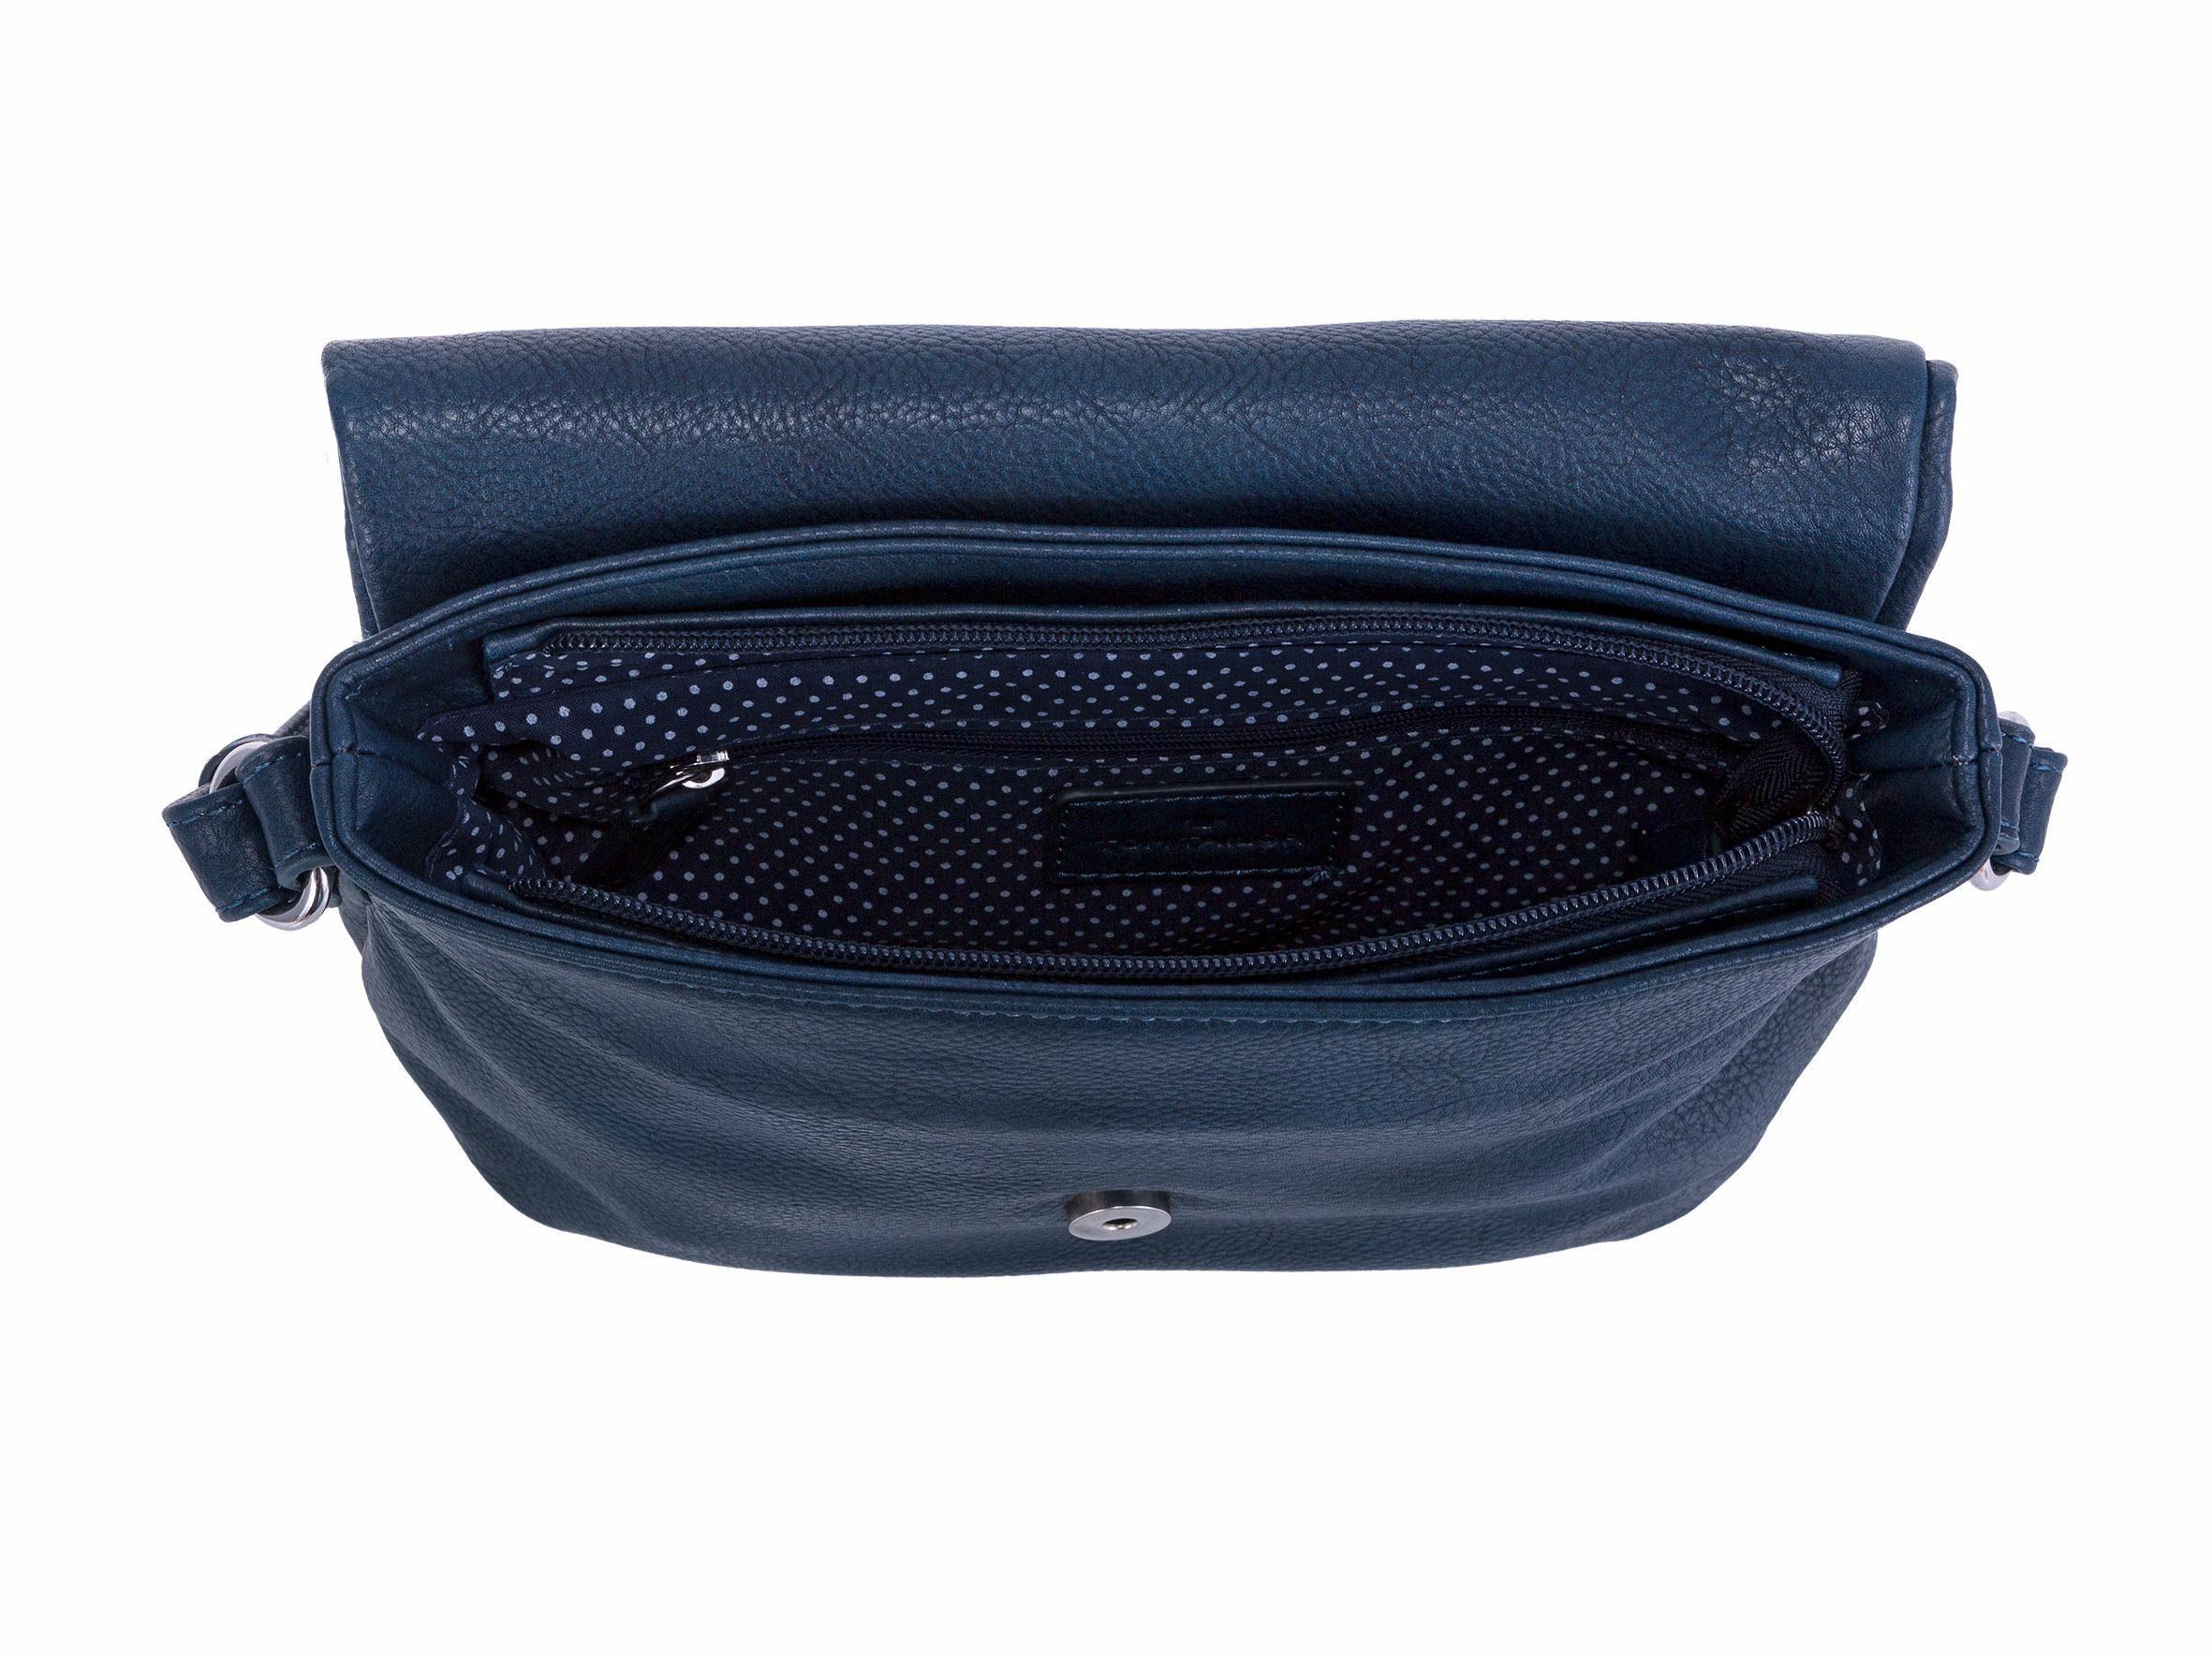 Tom Tailor Modischen Bag Zipper »lary« Crossbody Quasten Mit Umhängetasche Am rrn6ZU